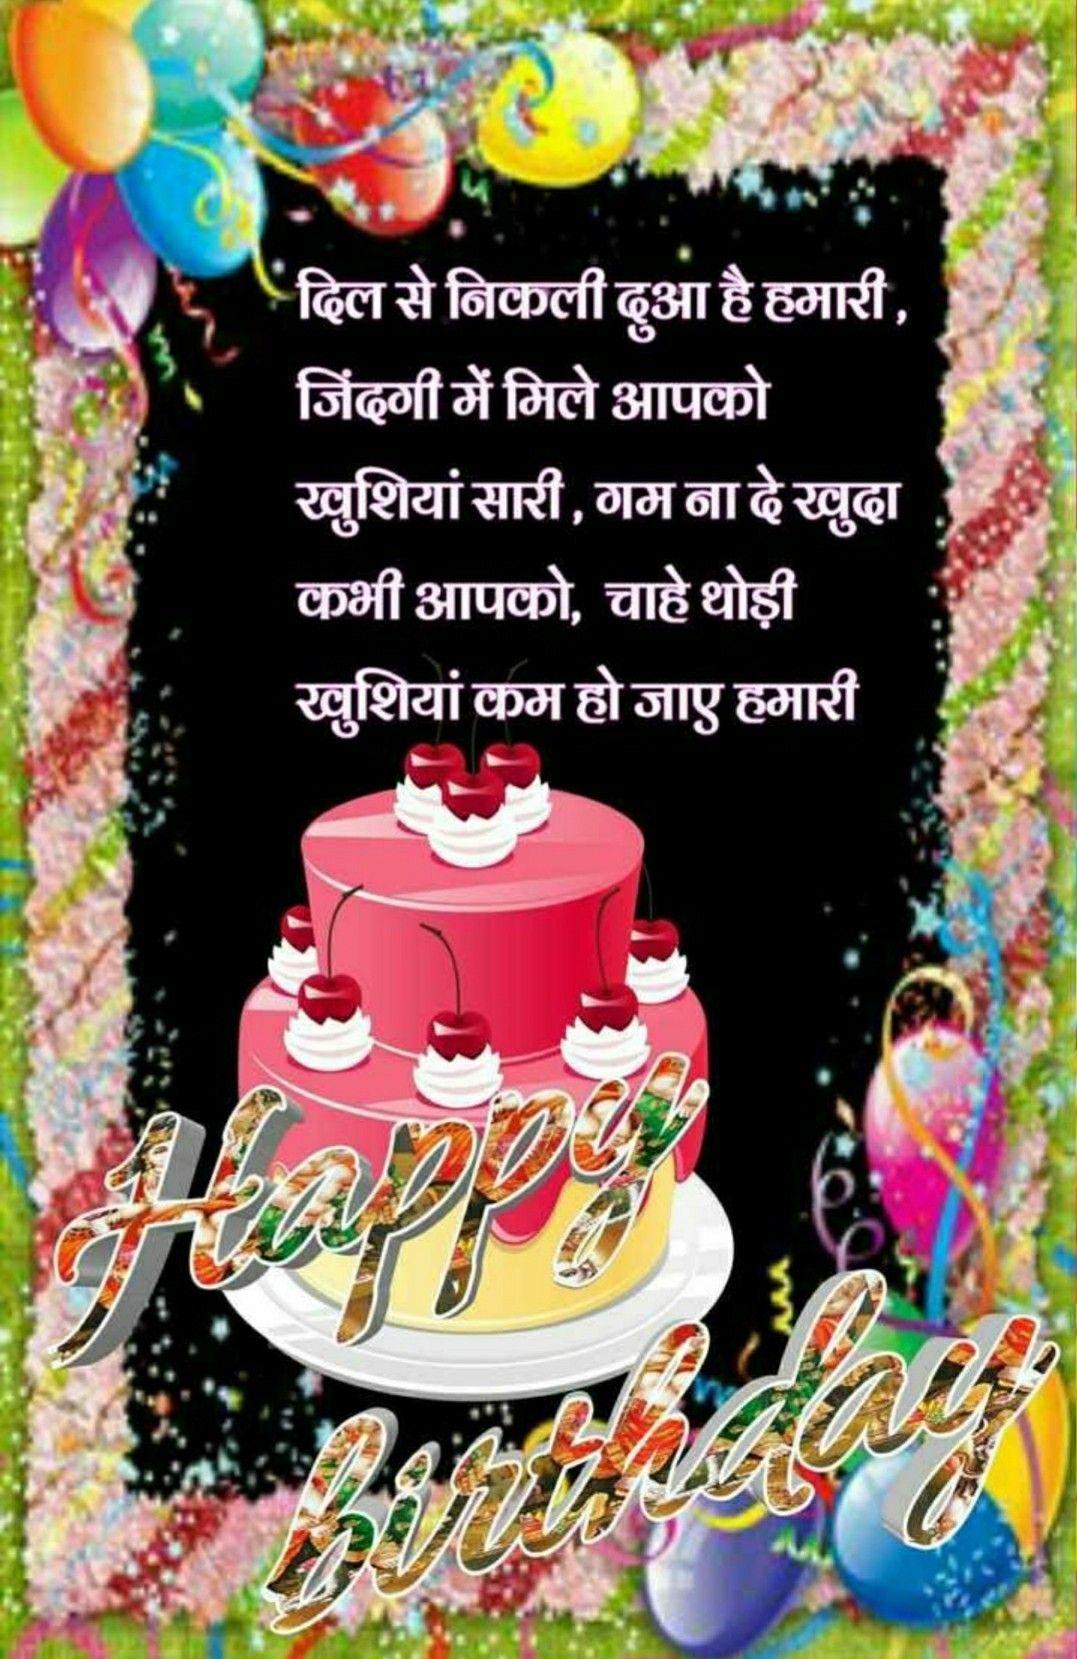 Pin By Mahendrasinghbairwa On My Saves Birthday Wishes For Girlfriend Happy Birthday Cake Images Happy Birthday Flowers Wishes